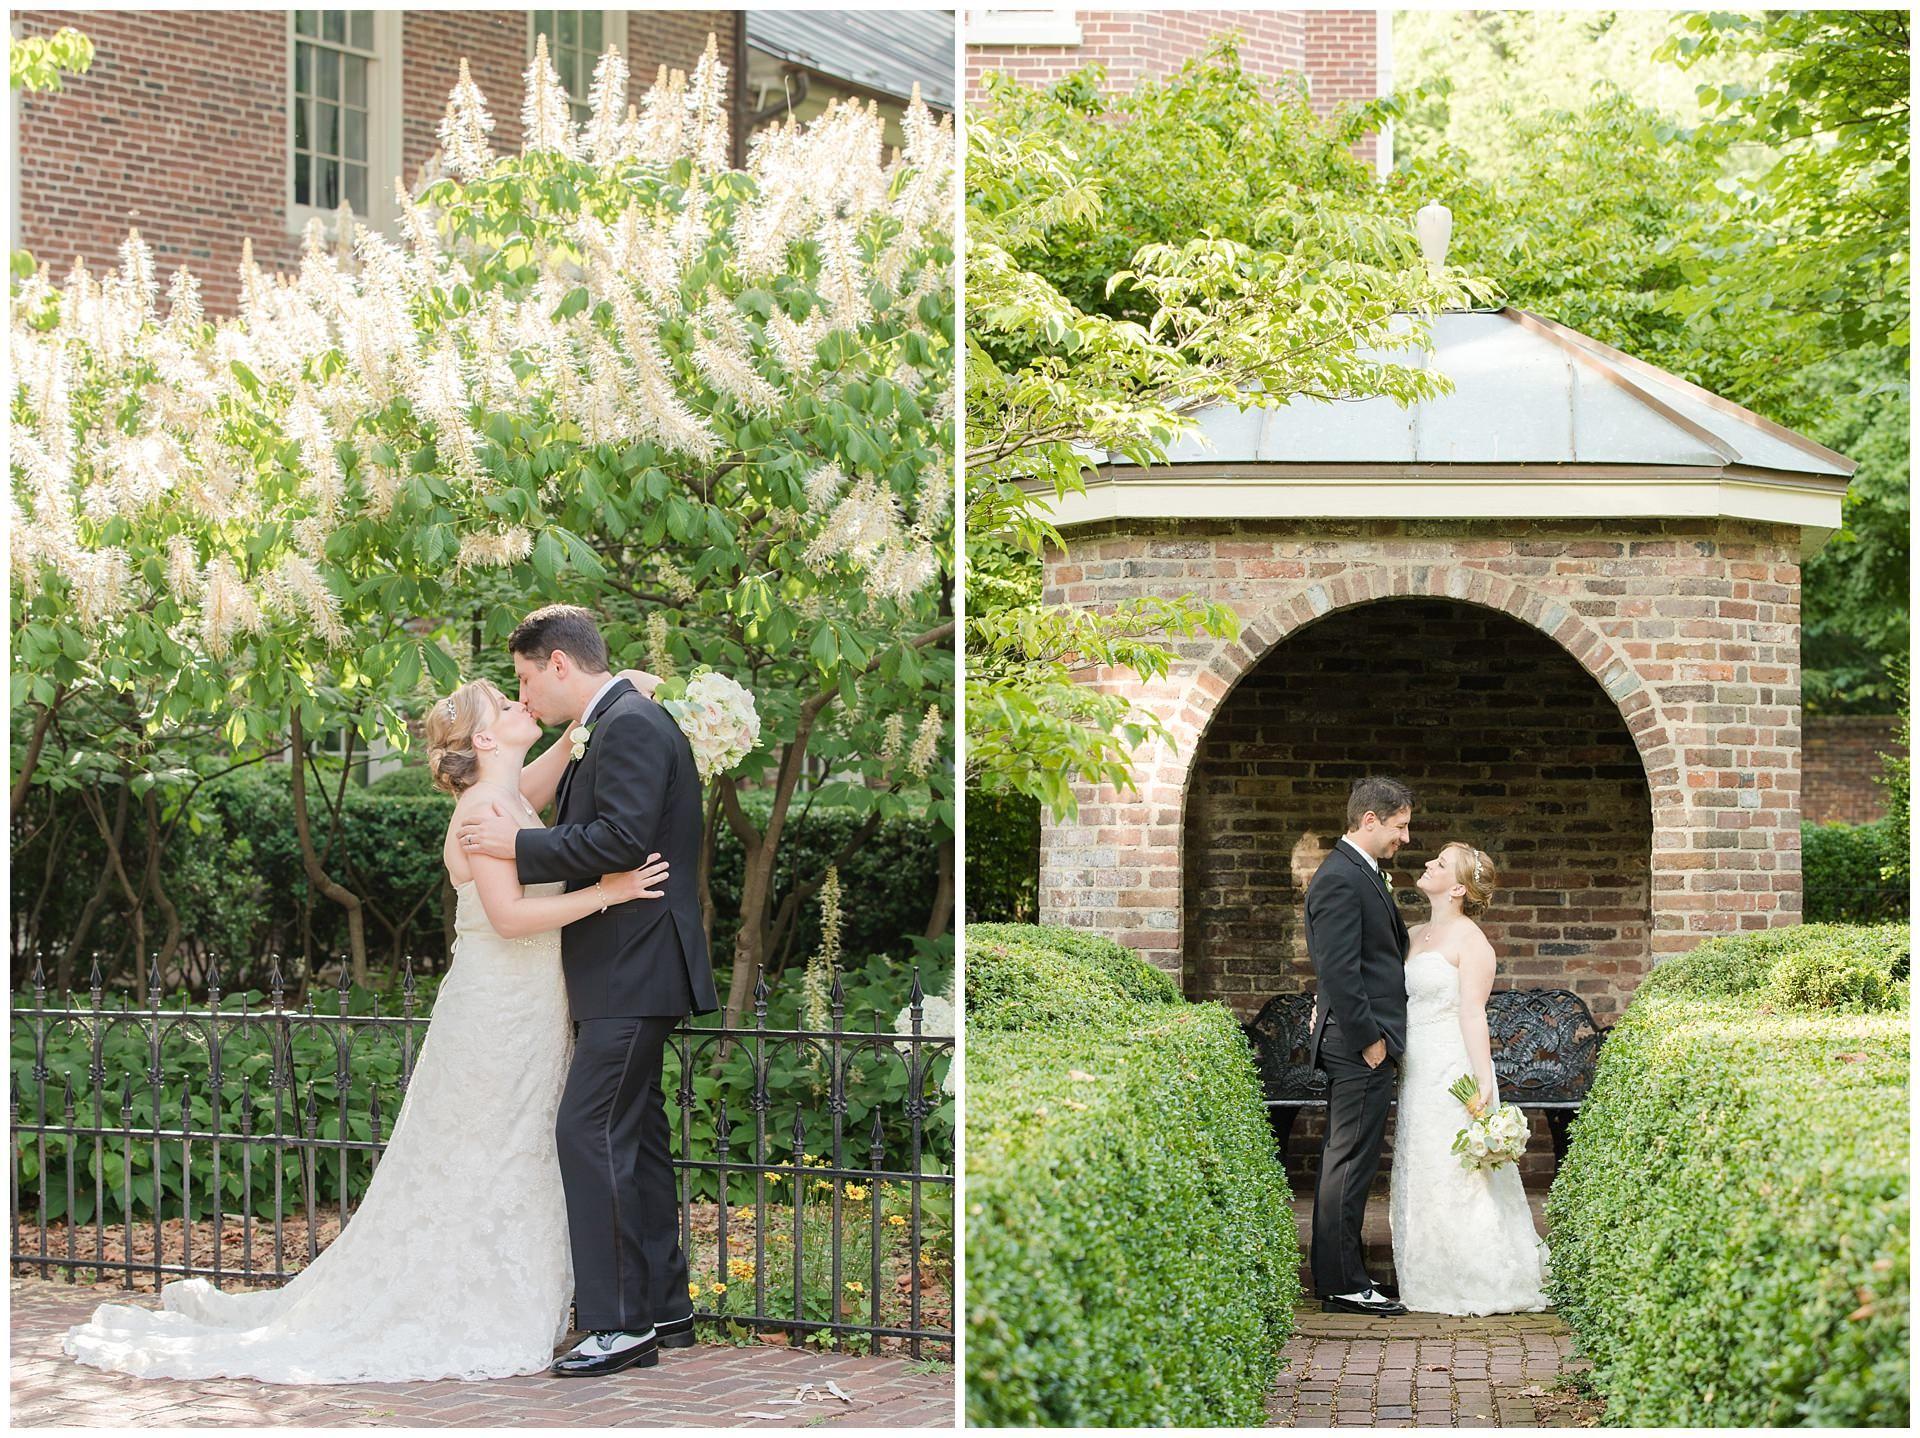 Outdoor Summer Wedding At Gratz Park And The Downtown Hilton In Lexington Ky Summer Wedding Outdoor Summer Wedding Ceremony Summer Wedding